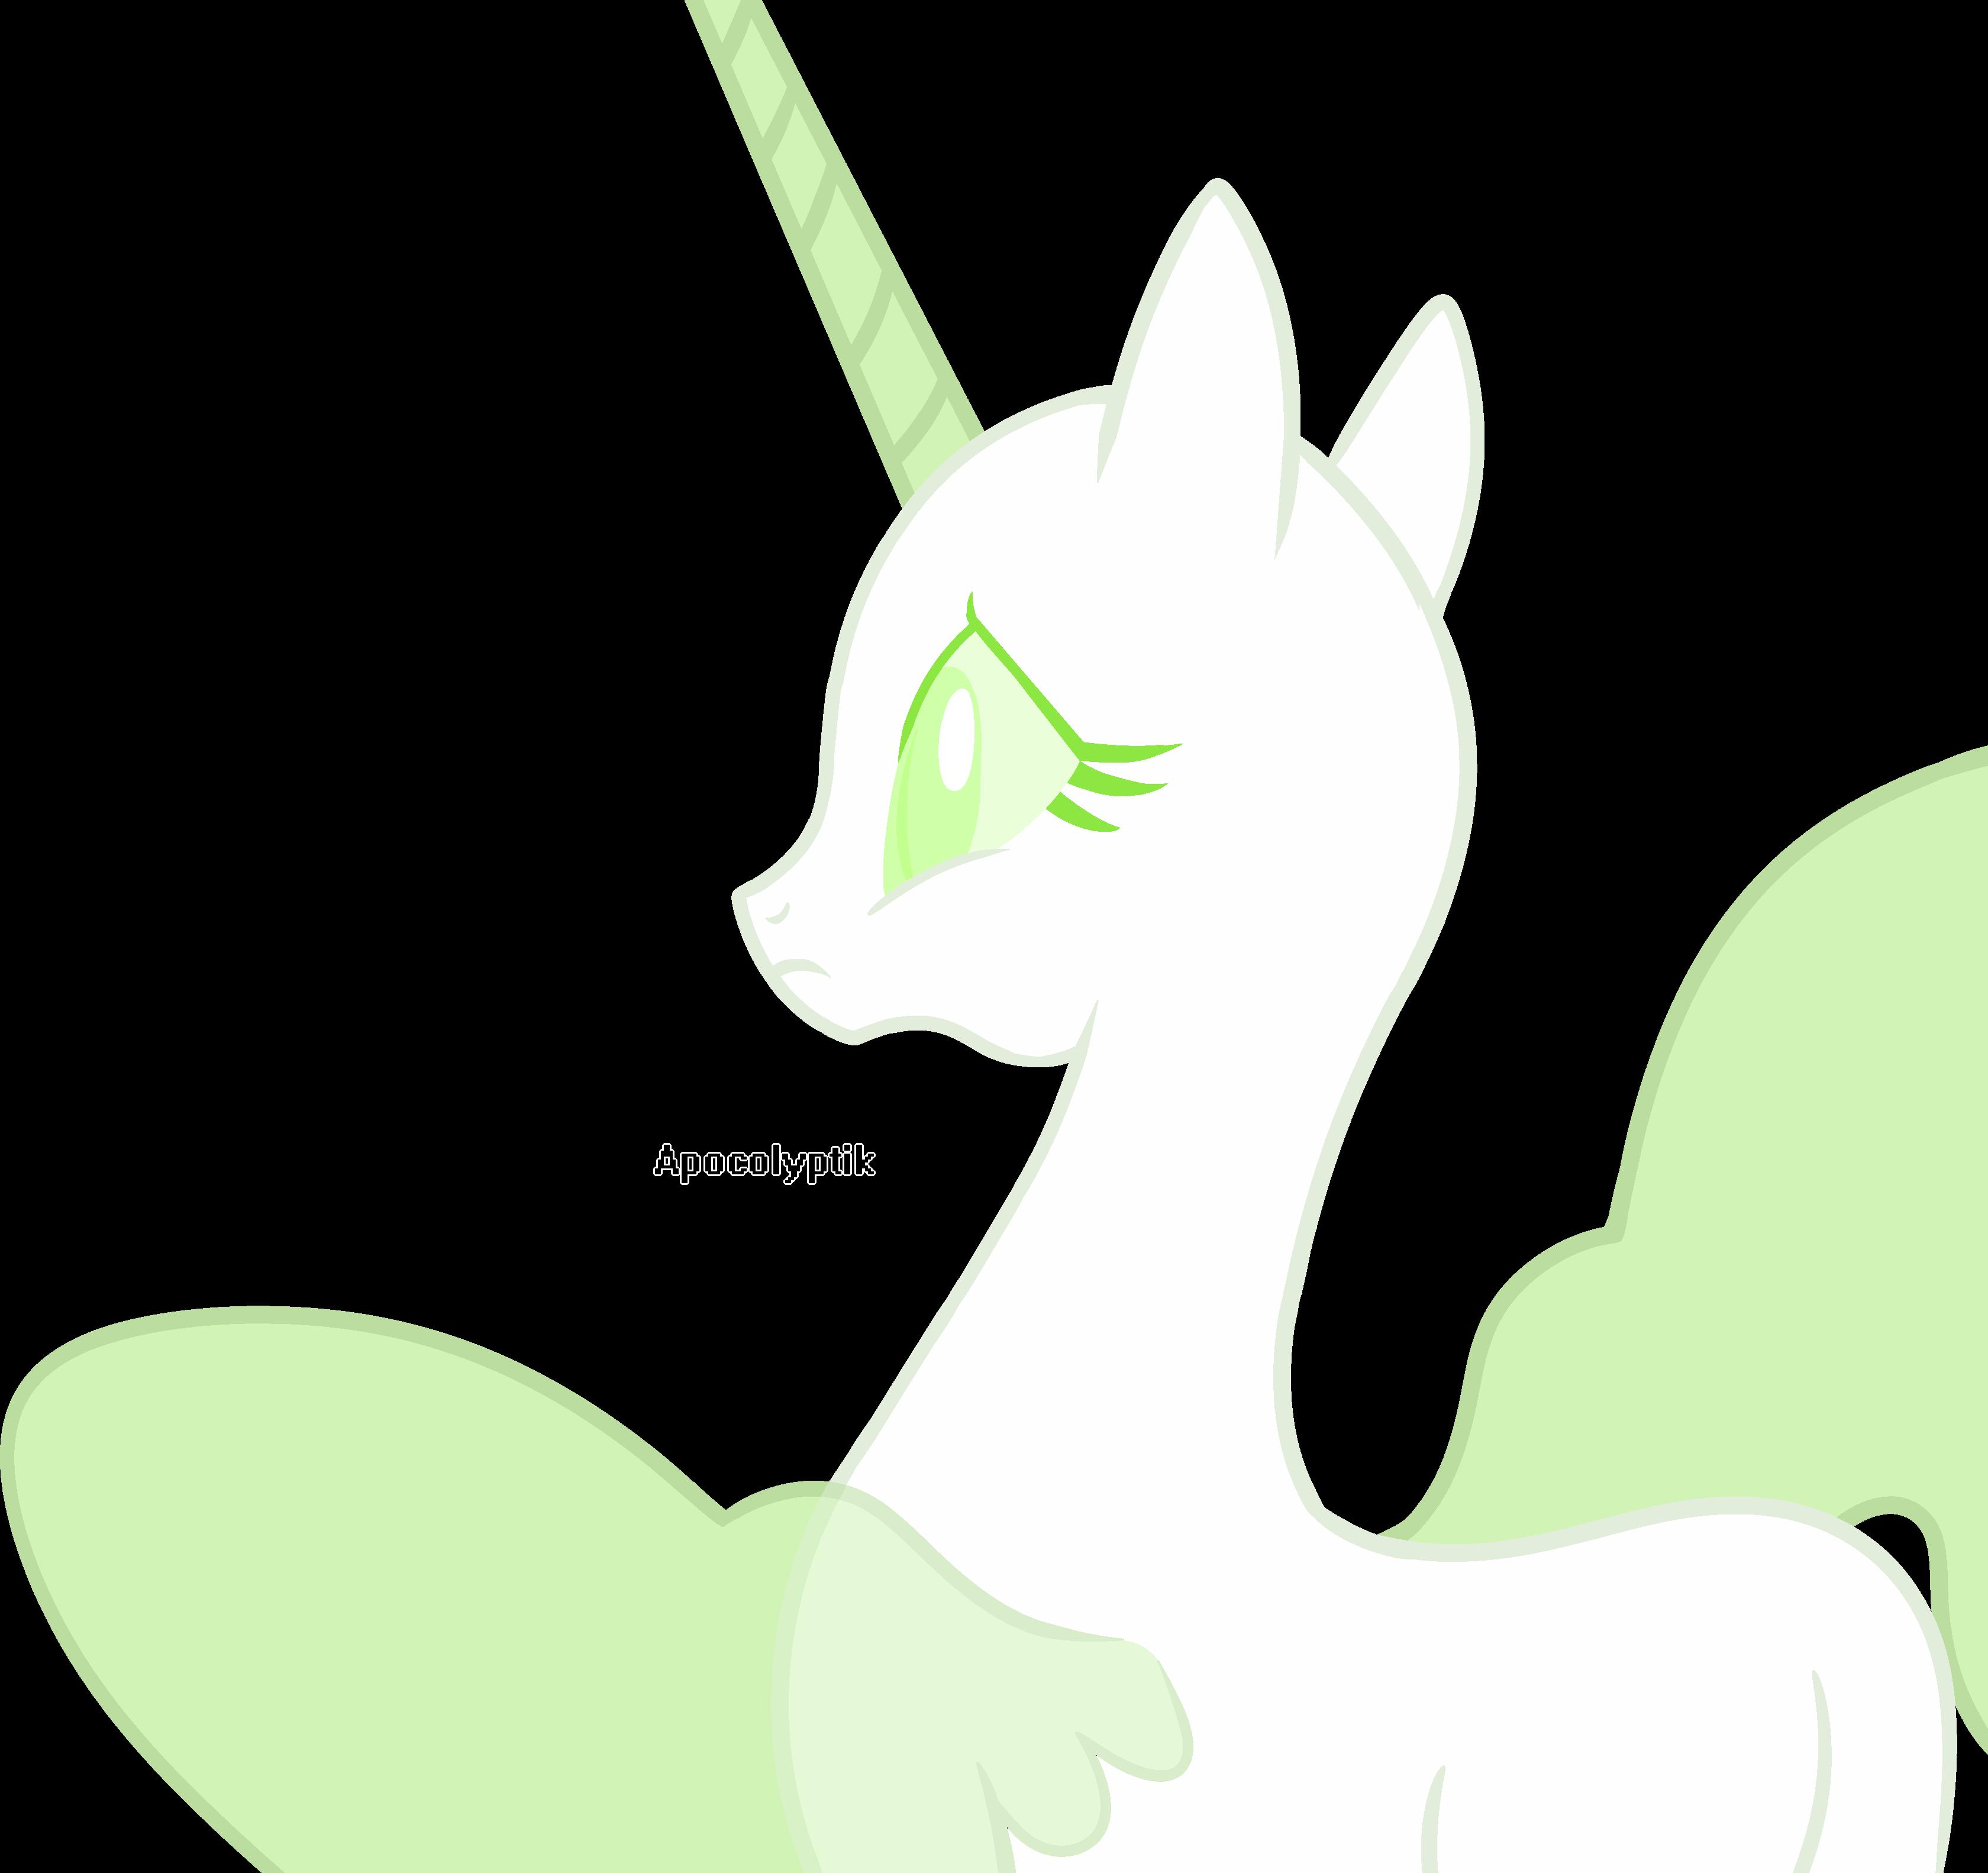 [1 Pony] Sad Alicorn Is Sad By ApocolyptikBases On DeviantArt